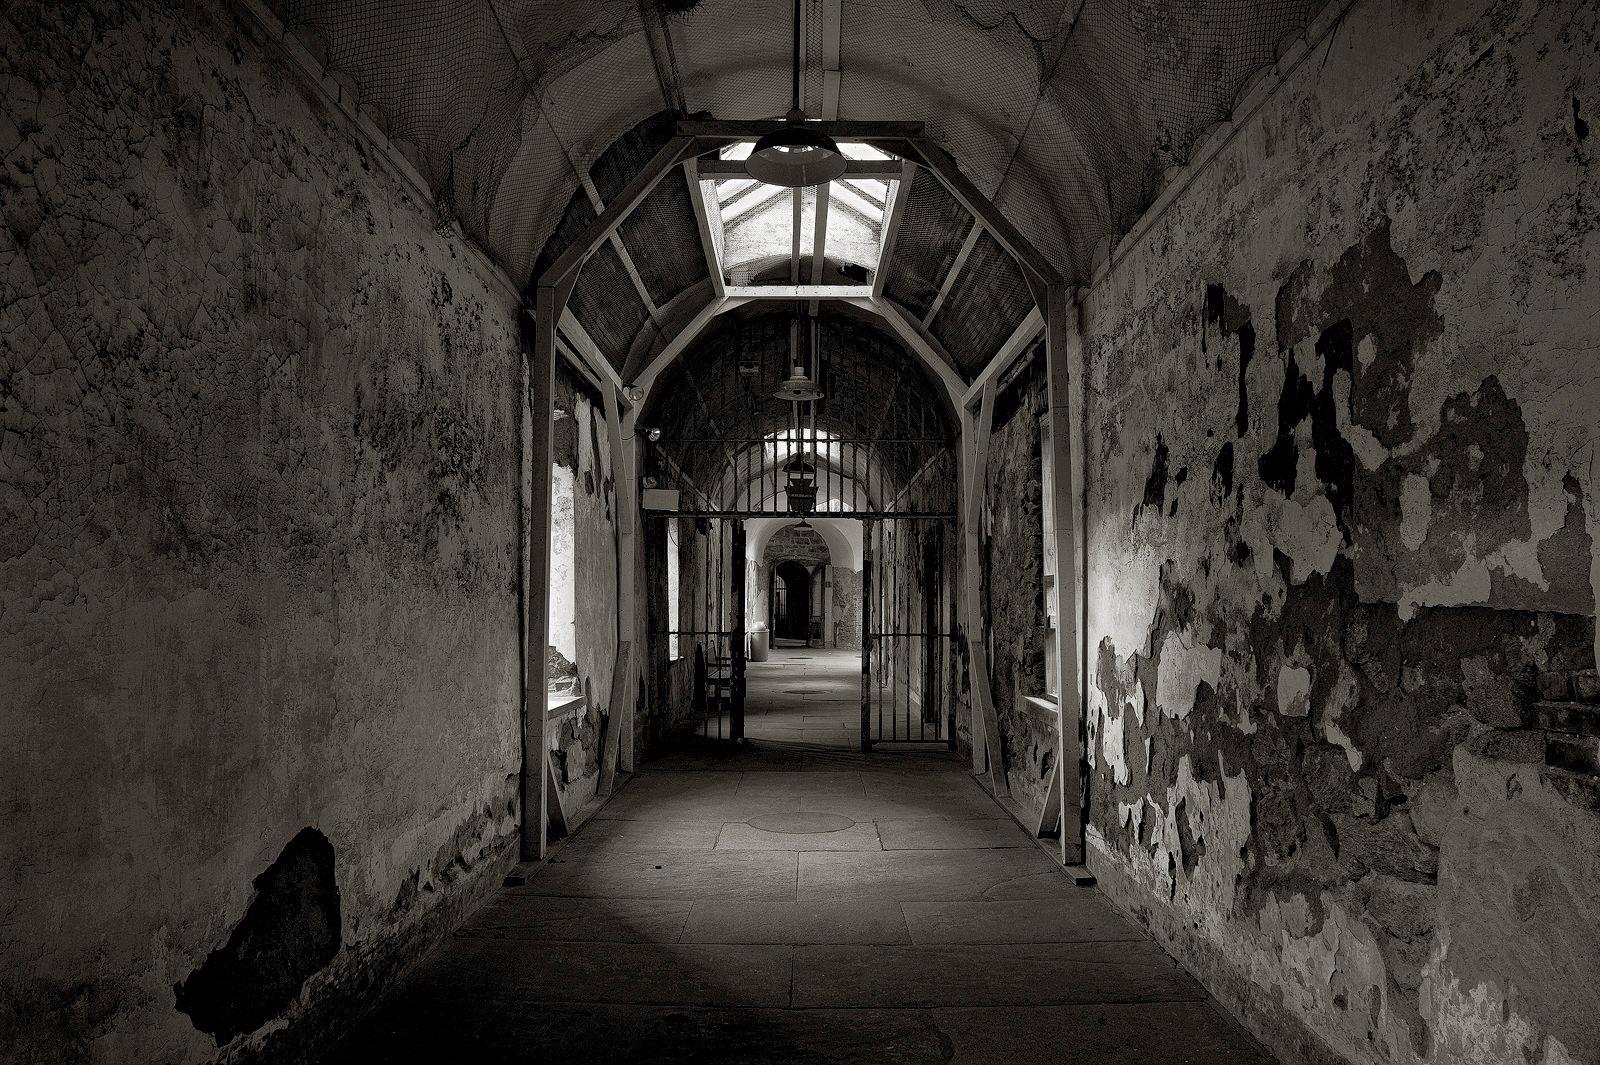 1hallway